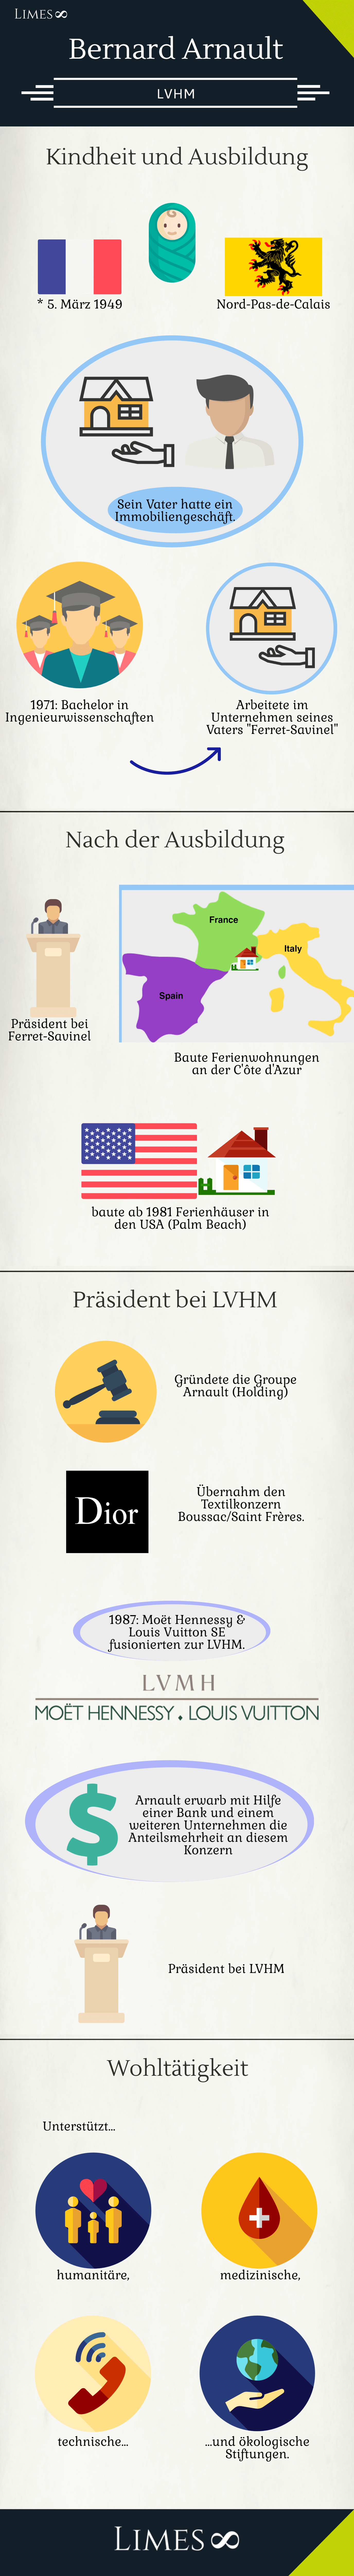 Infografik über Bernard Arnault